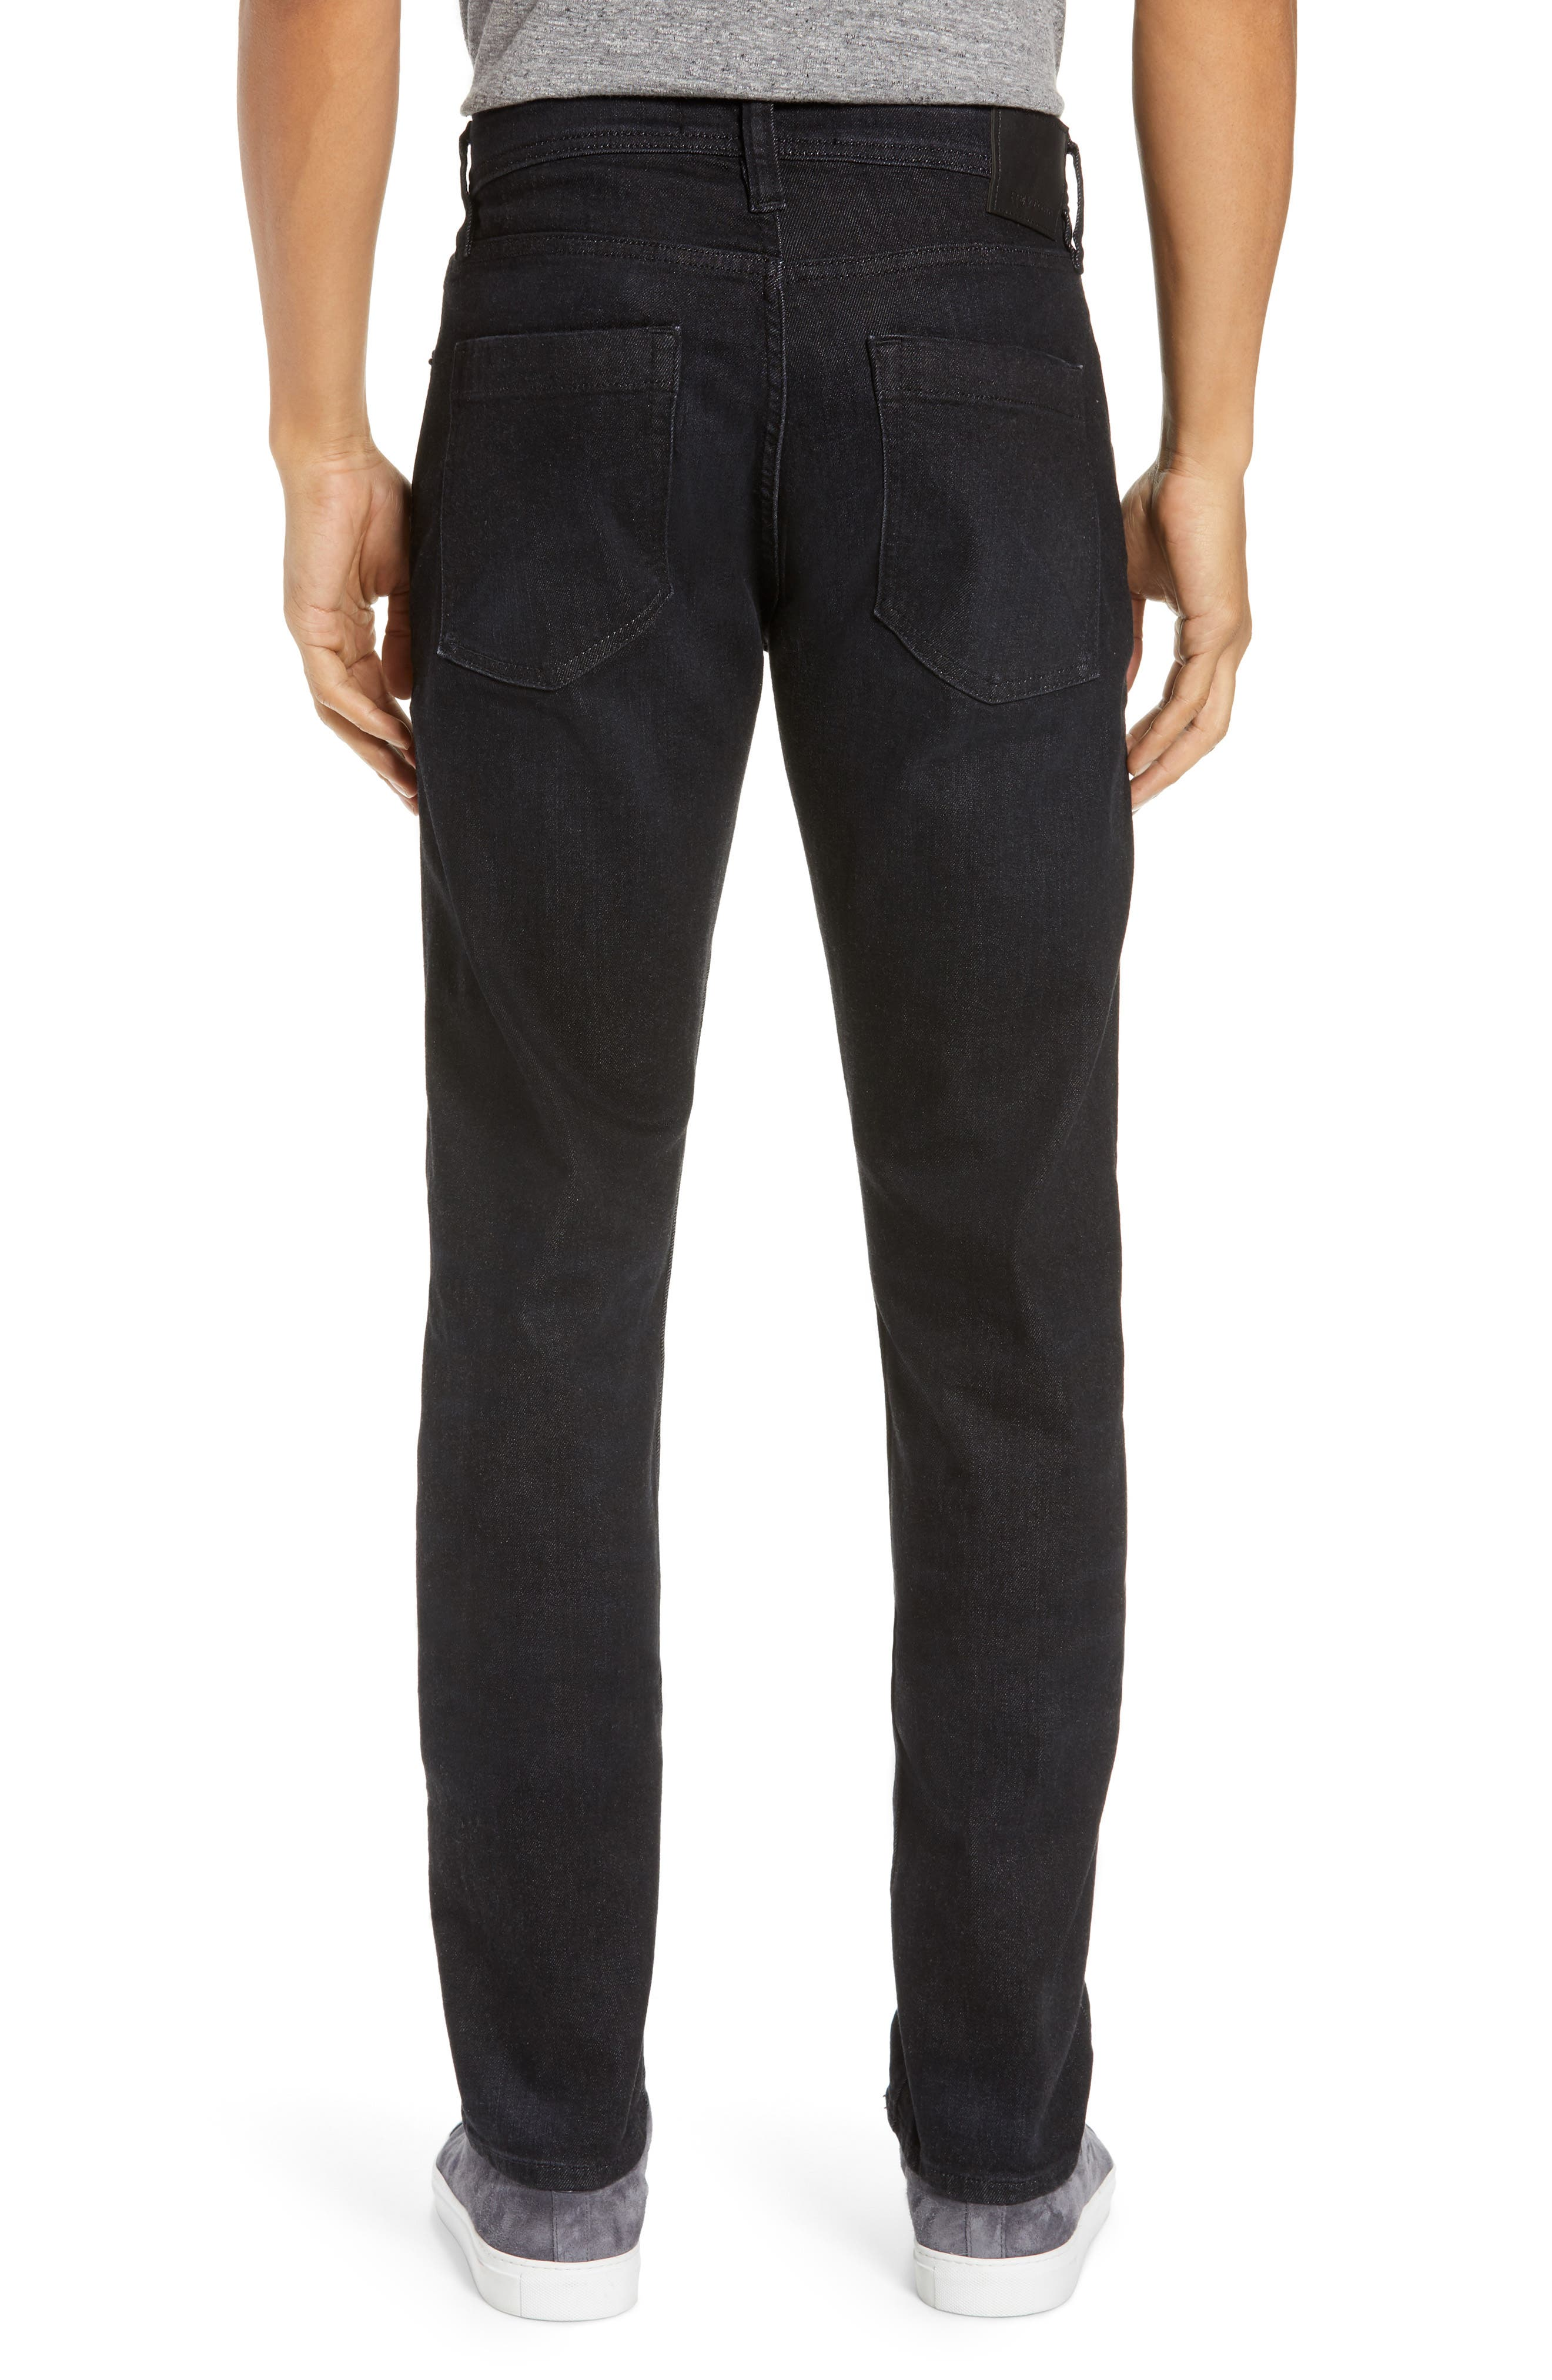 REVTOWN,                             Sharp Slim Fit Jeans,                             Alternate thumbnail 2, color,                             COAL BLACK